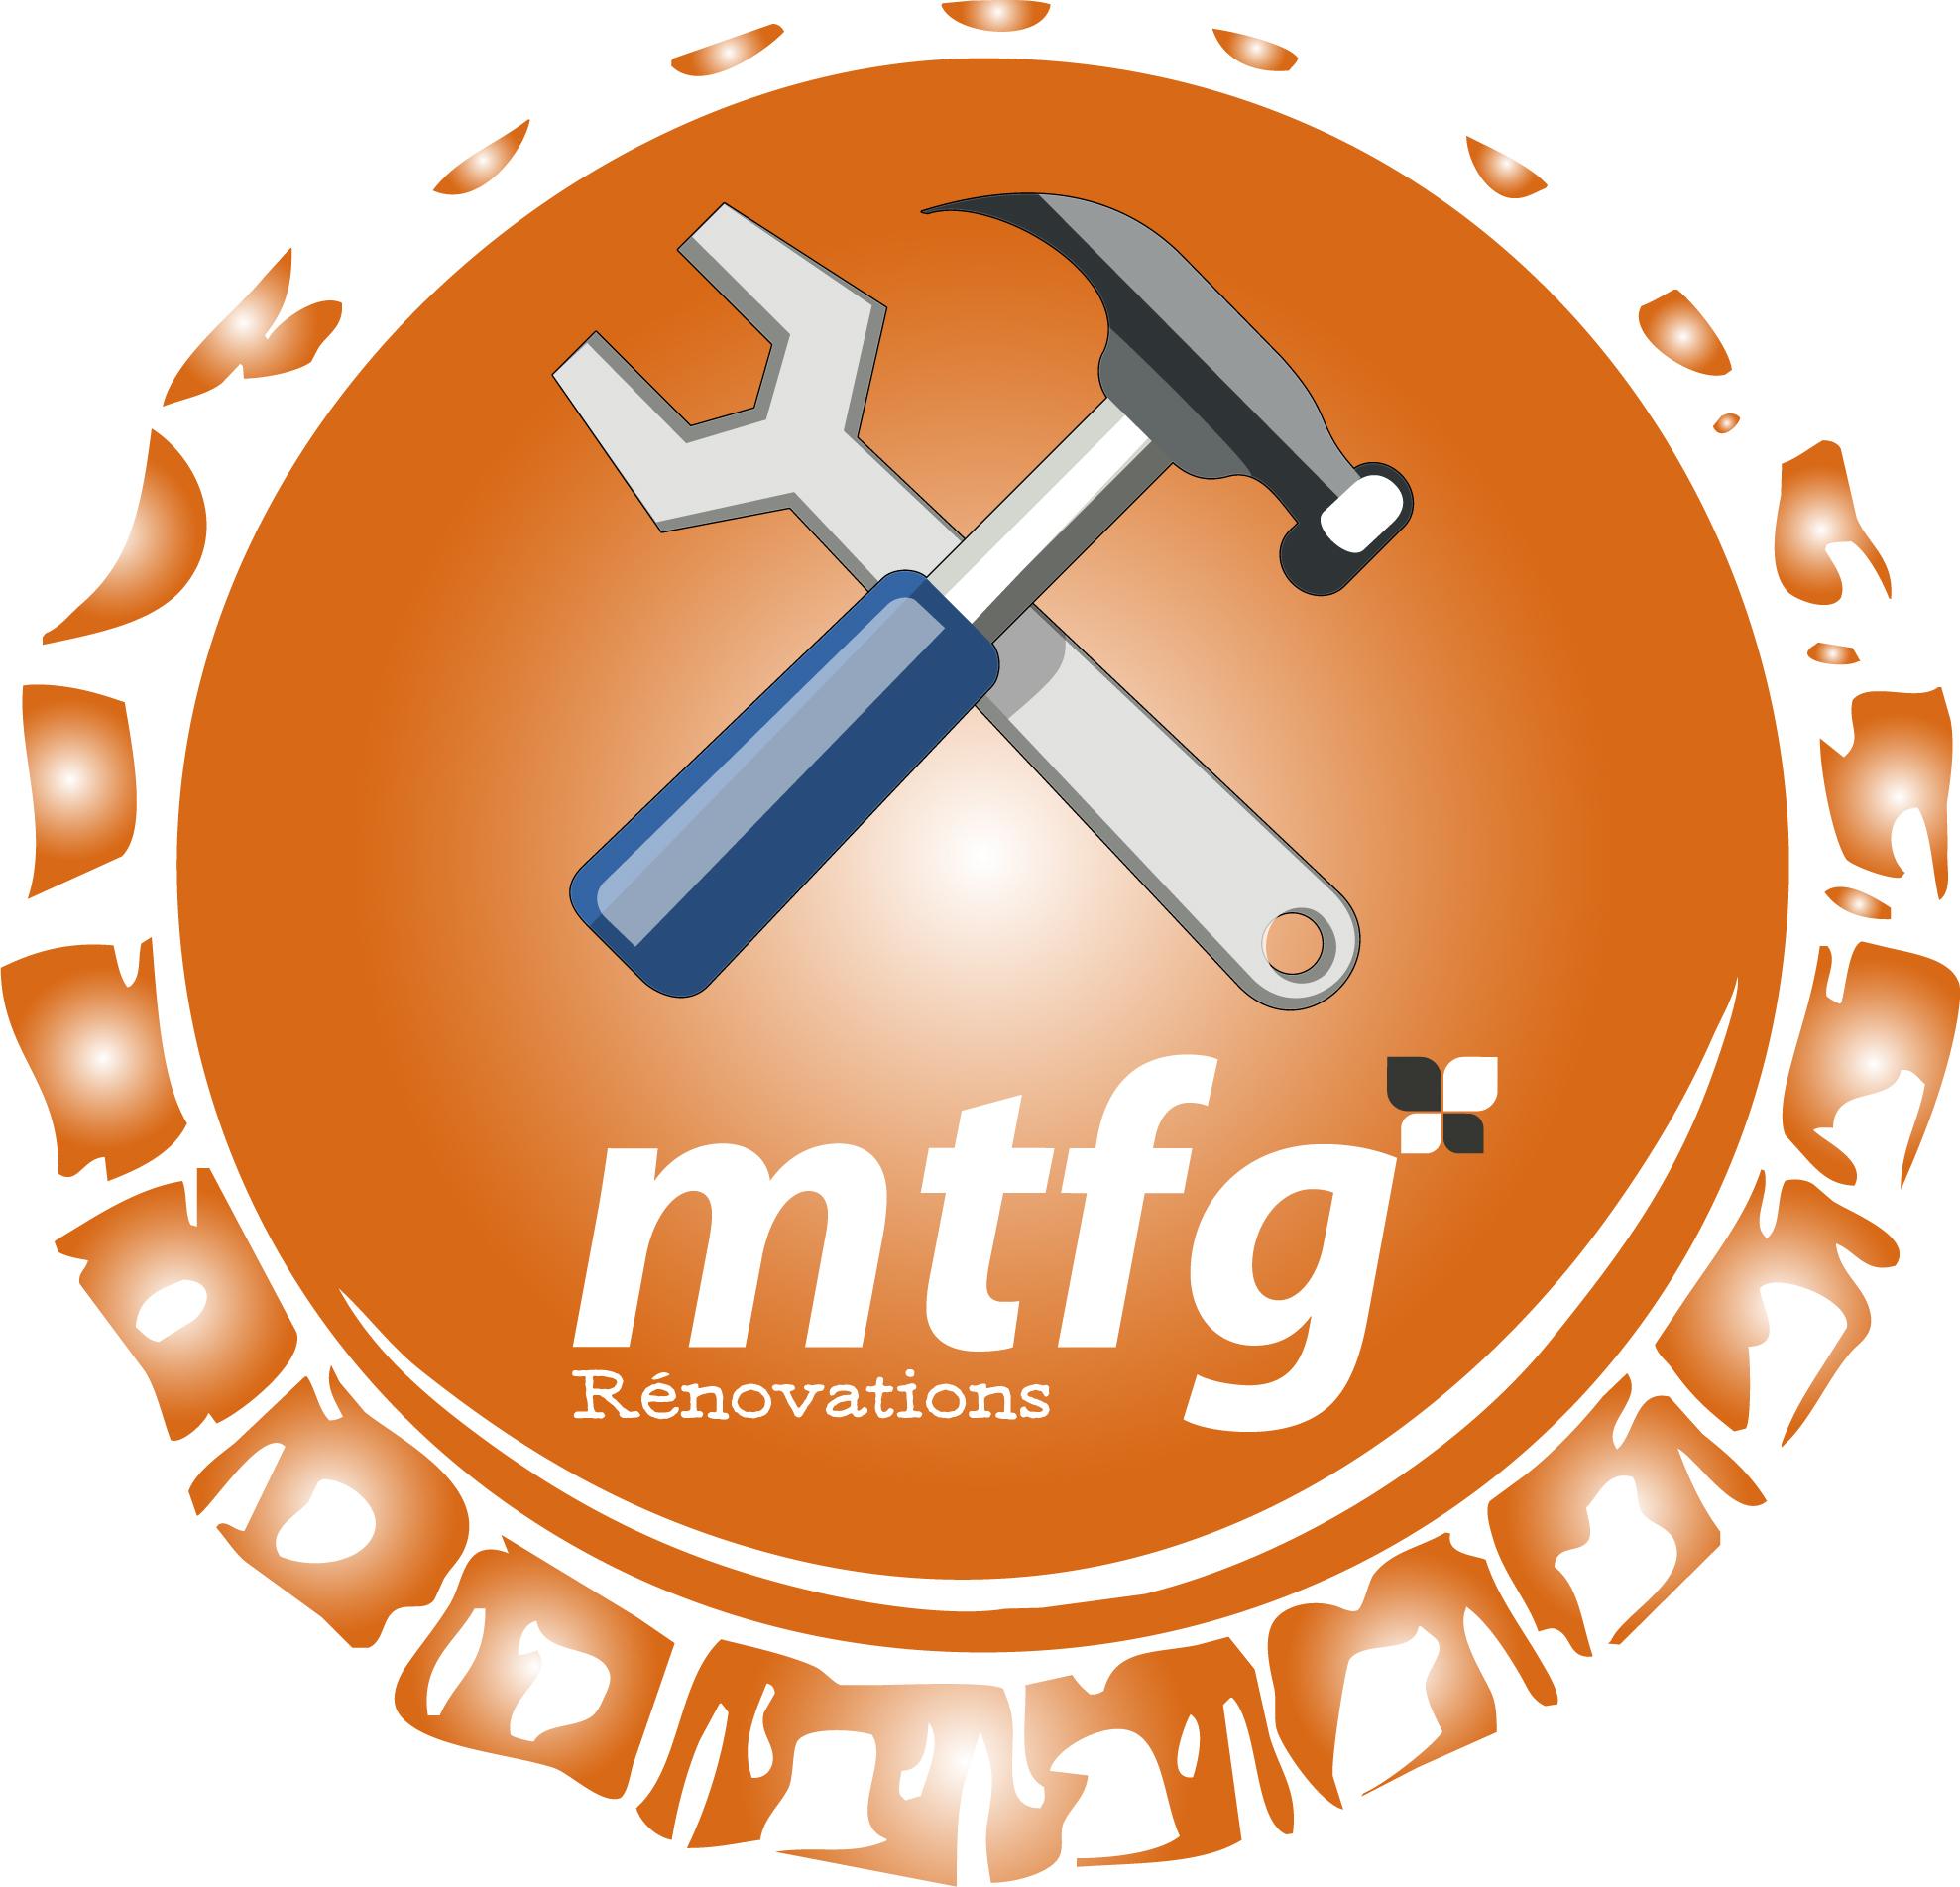 MTFG Renovations